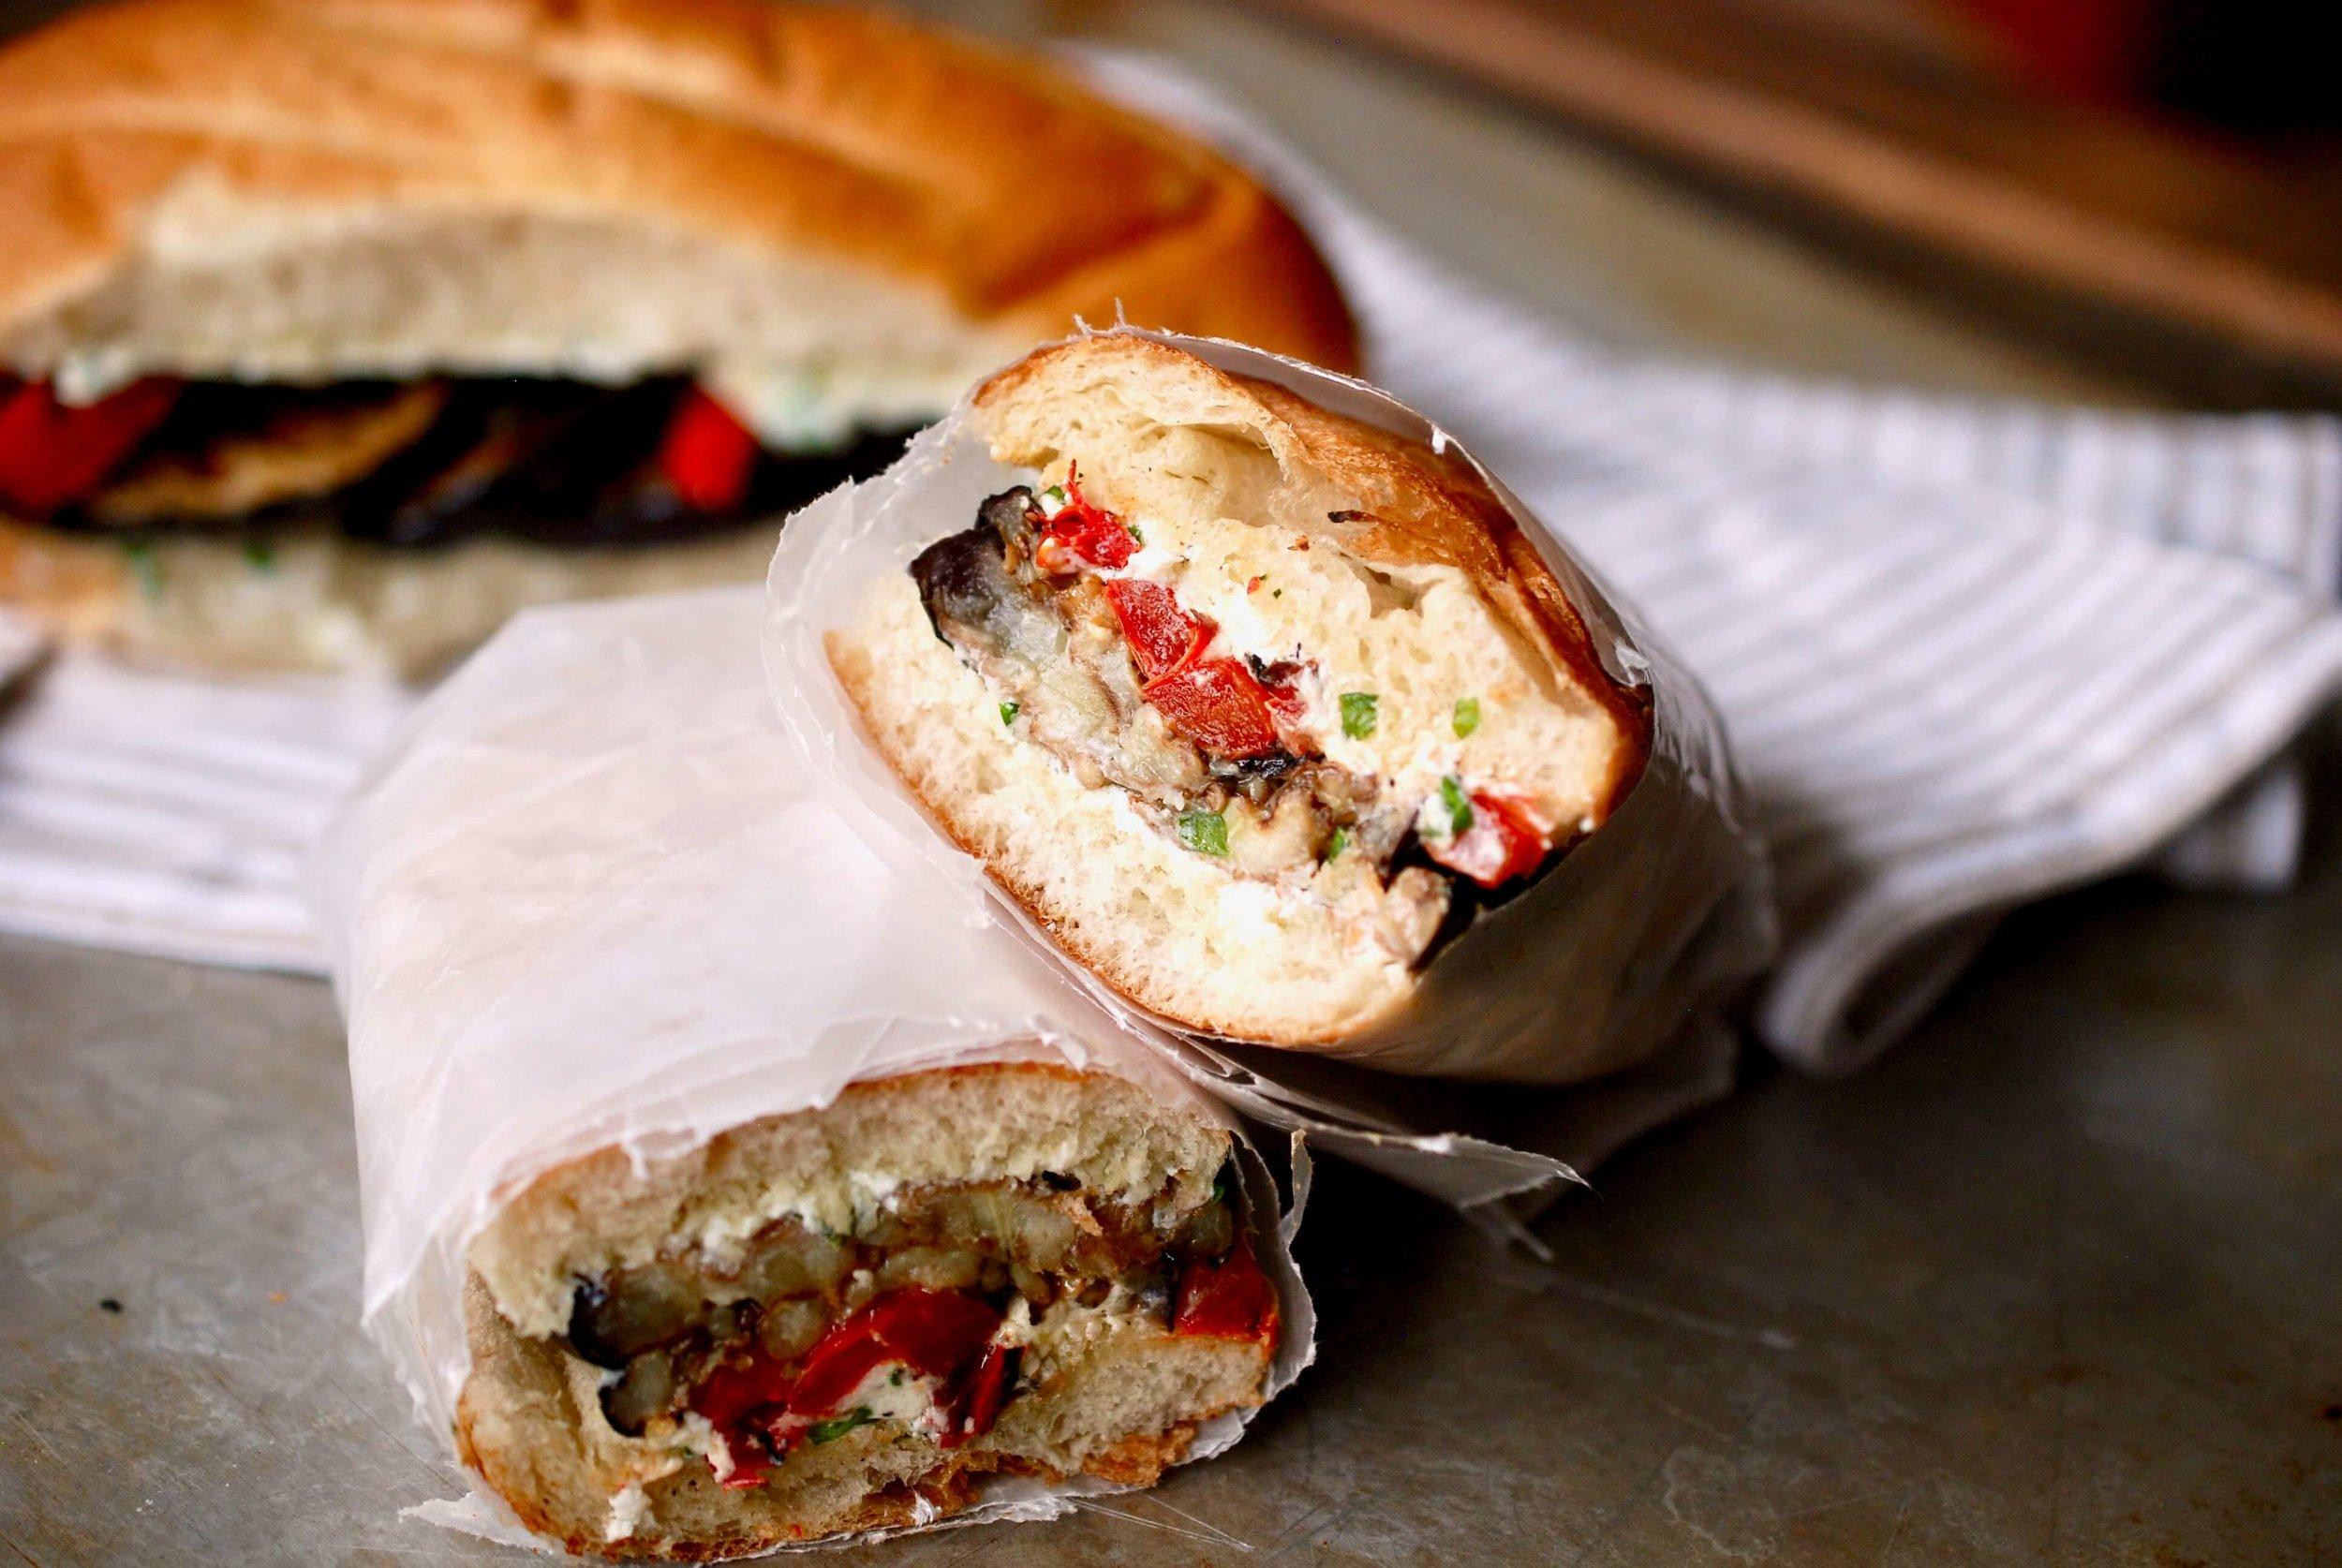 Sandwich_cut.jpg